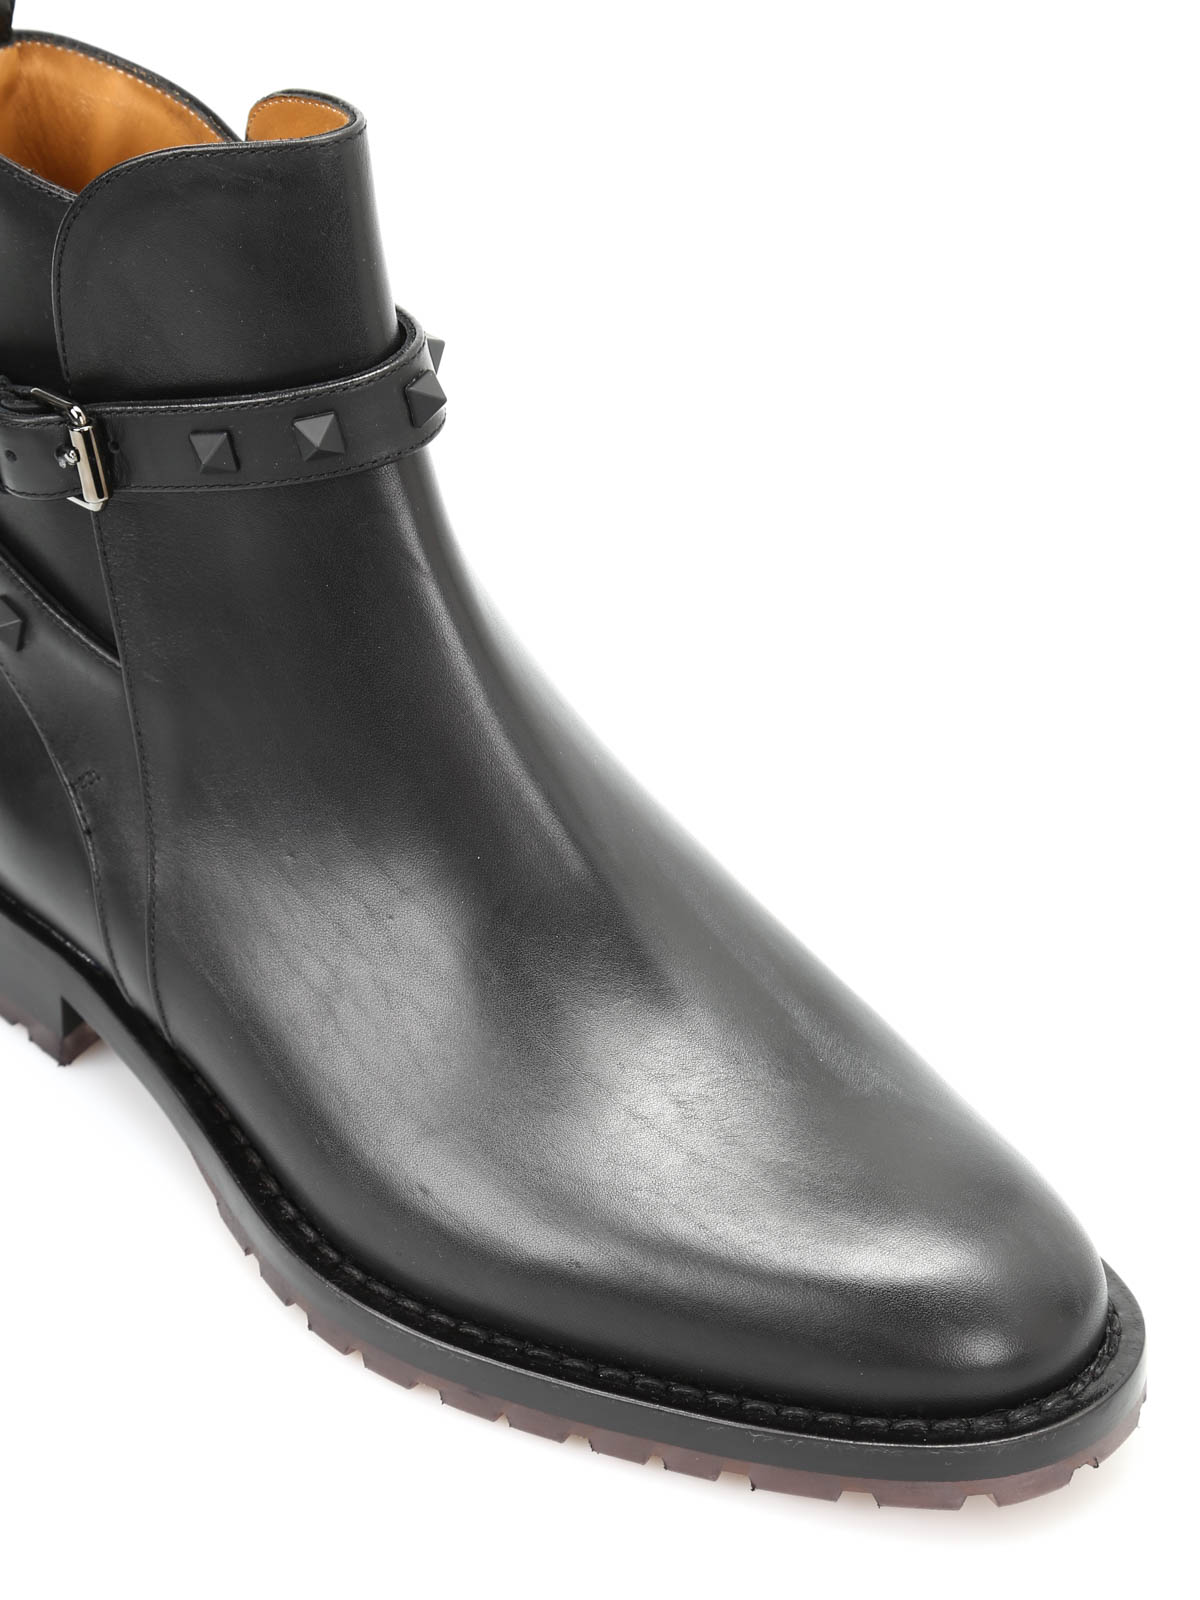 6c37de56e052f Valentino - Beatle ankle boots - ankle boots - LY2S0878VTR 0NO ...